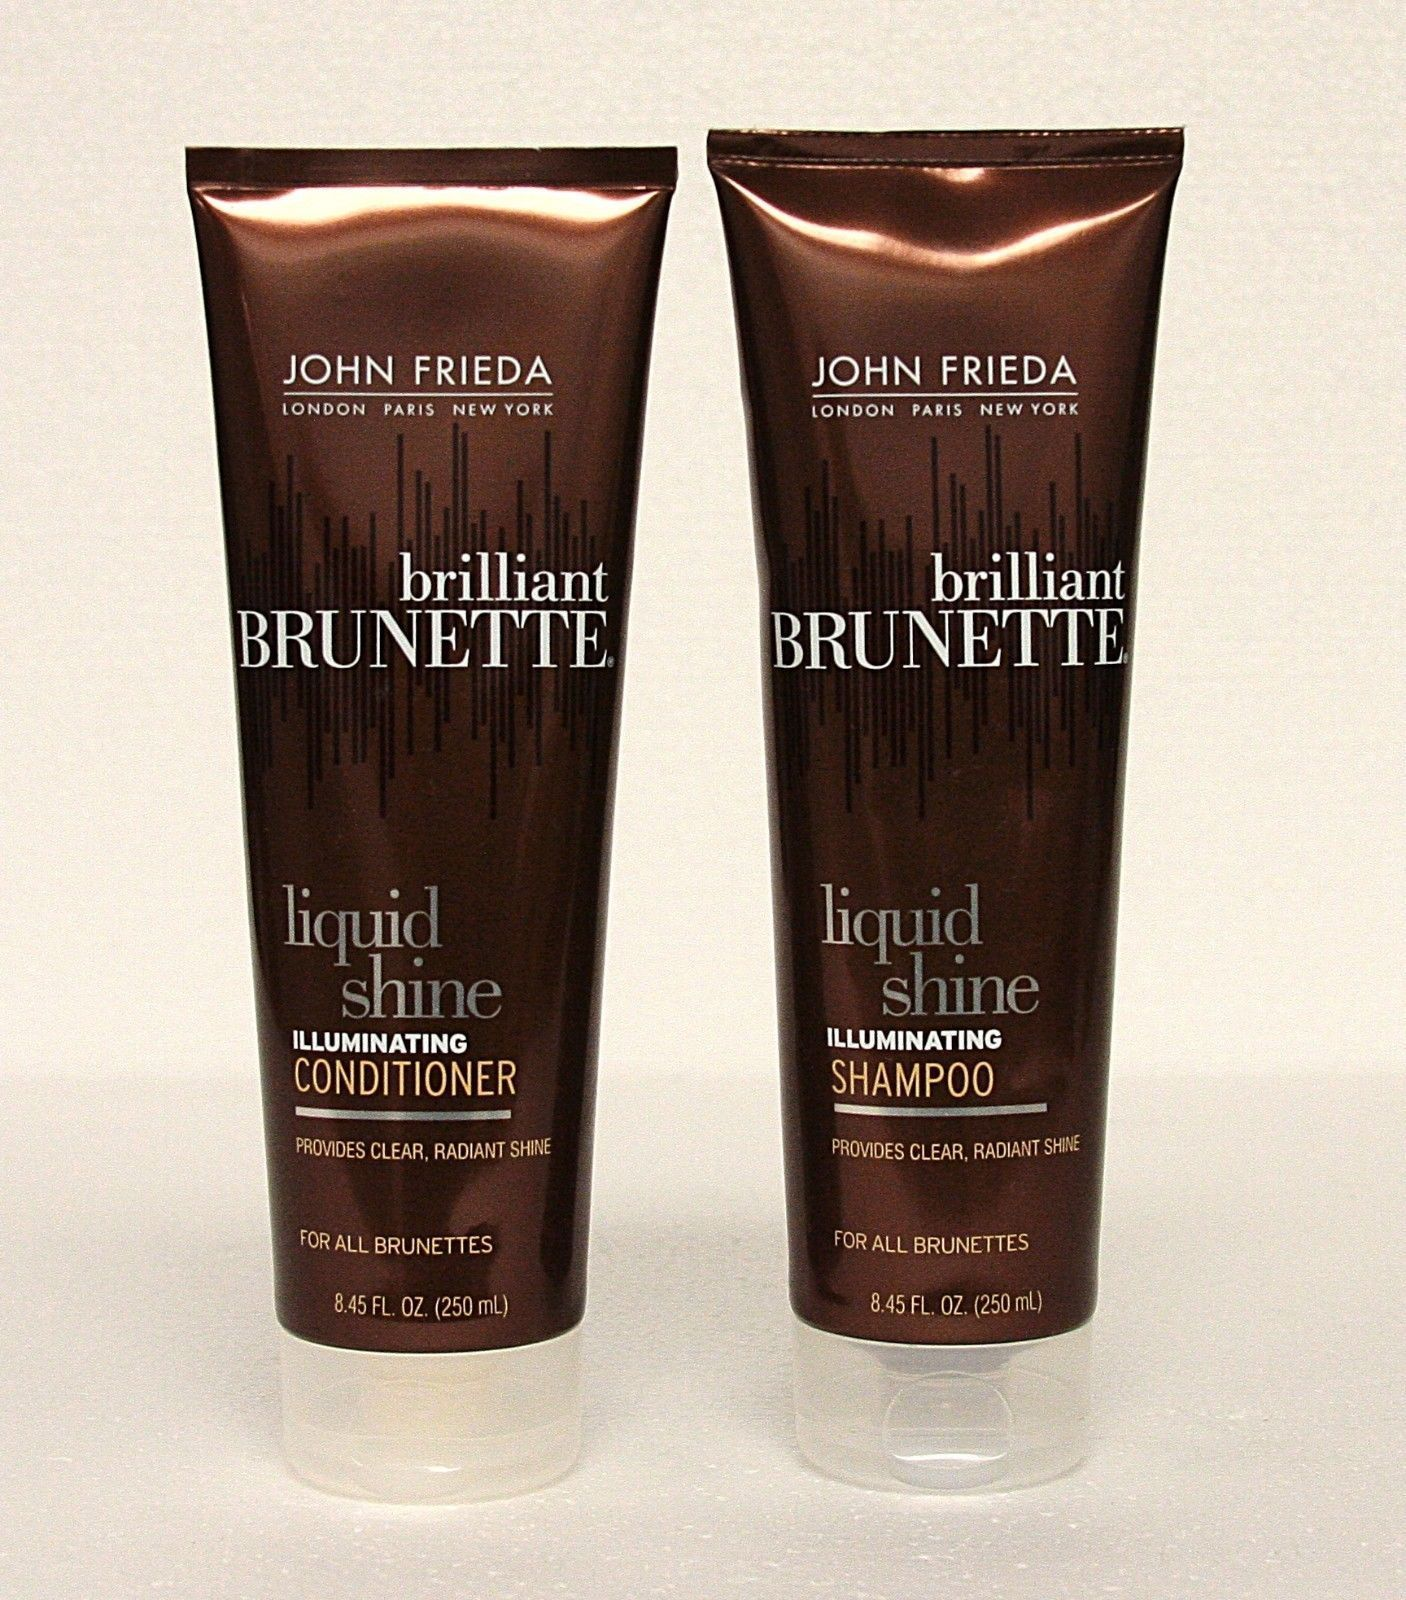 JOHN FRIEDA Brilliant Brunette Liquid Shine Shampoo u Conditioner